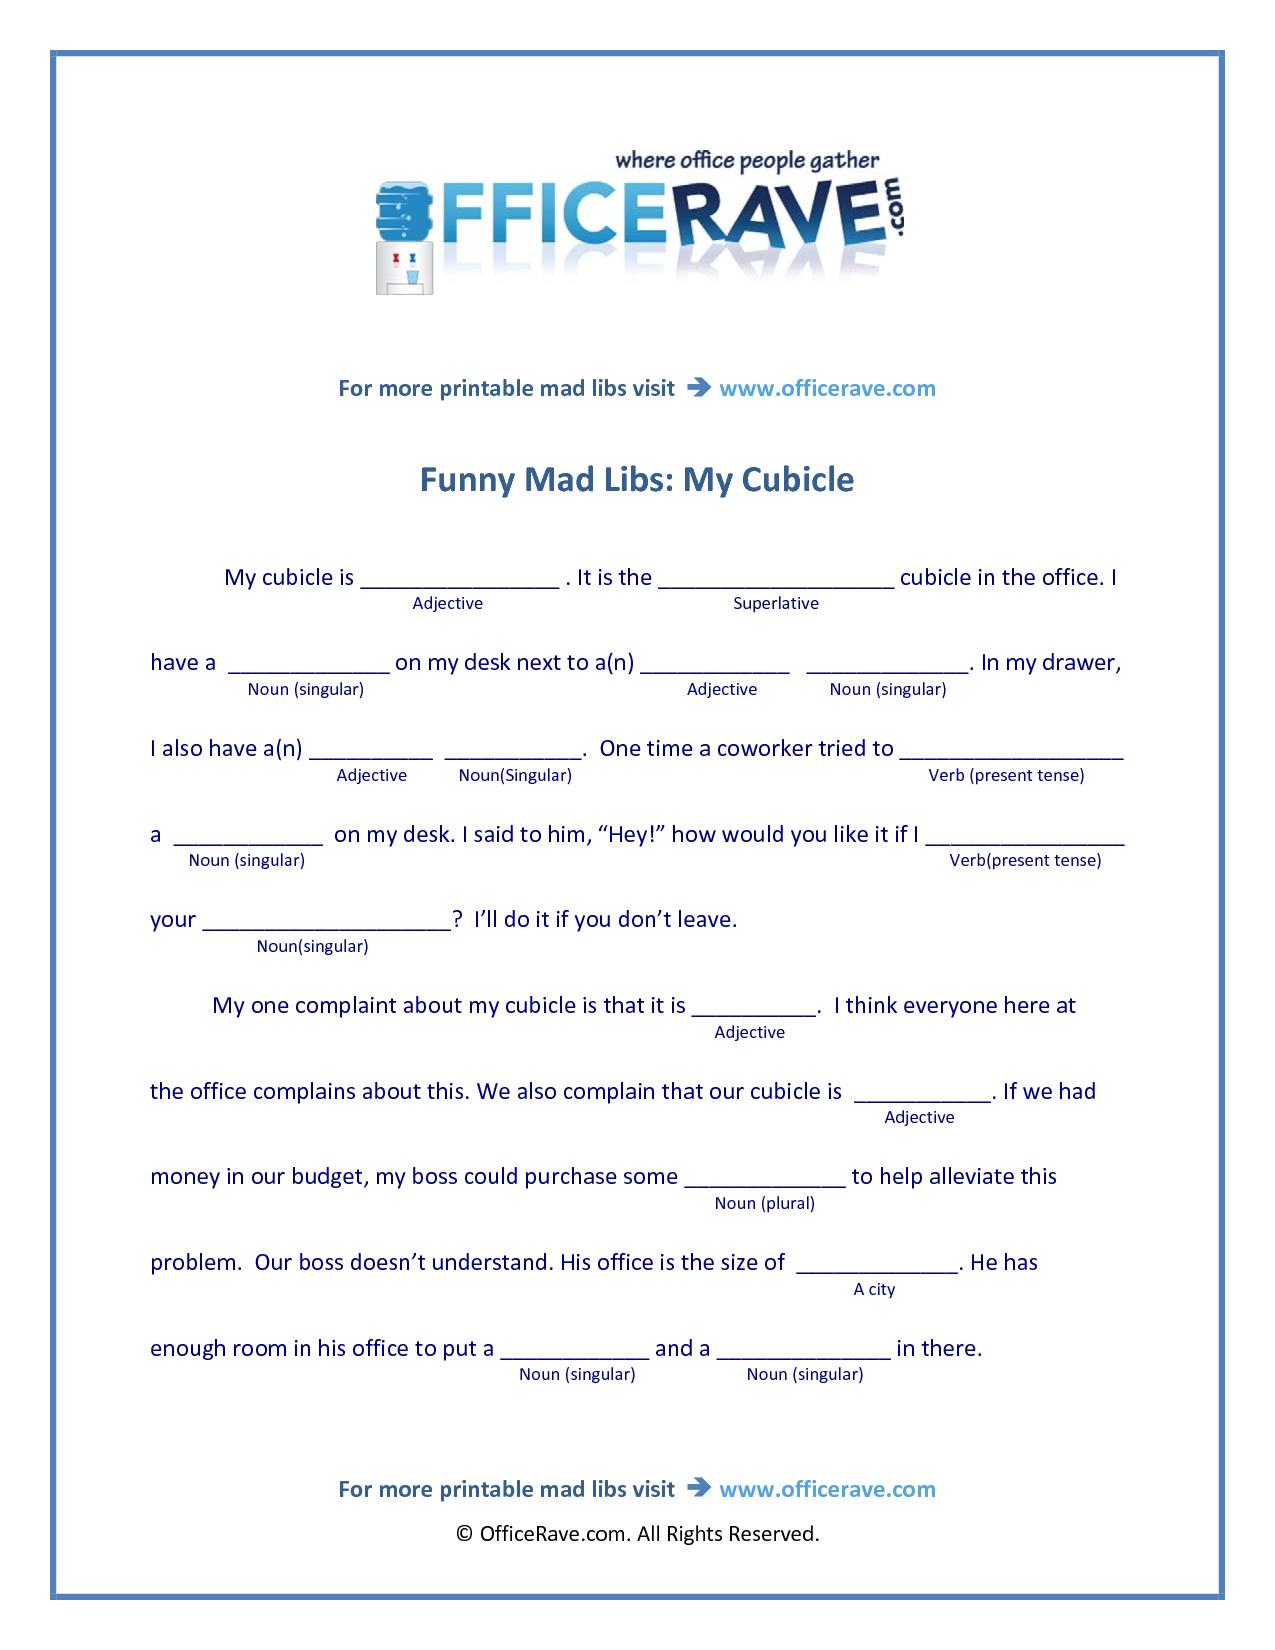 Mad Libs Printable | Free Printable Mad Libs | Funny | Baby Shower | Funny Mad Libs Printable Worksheets